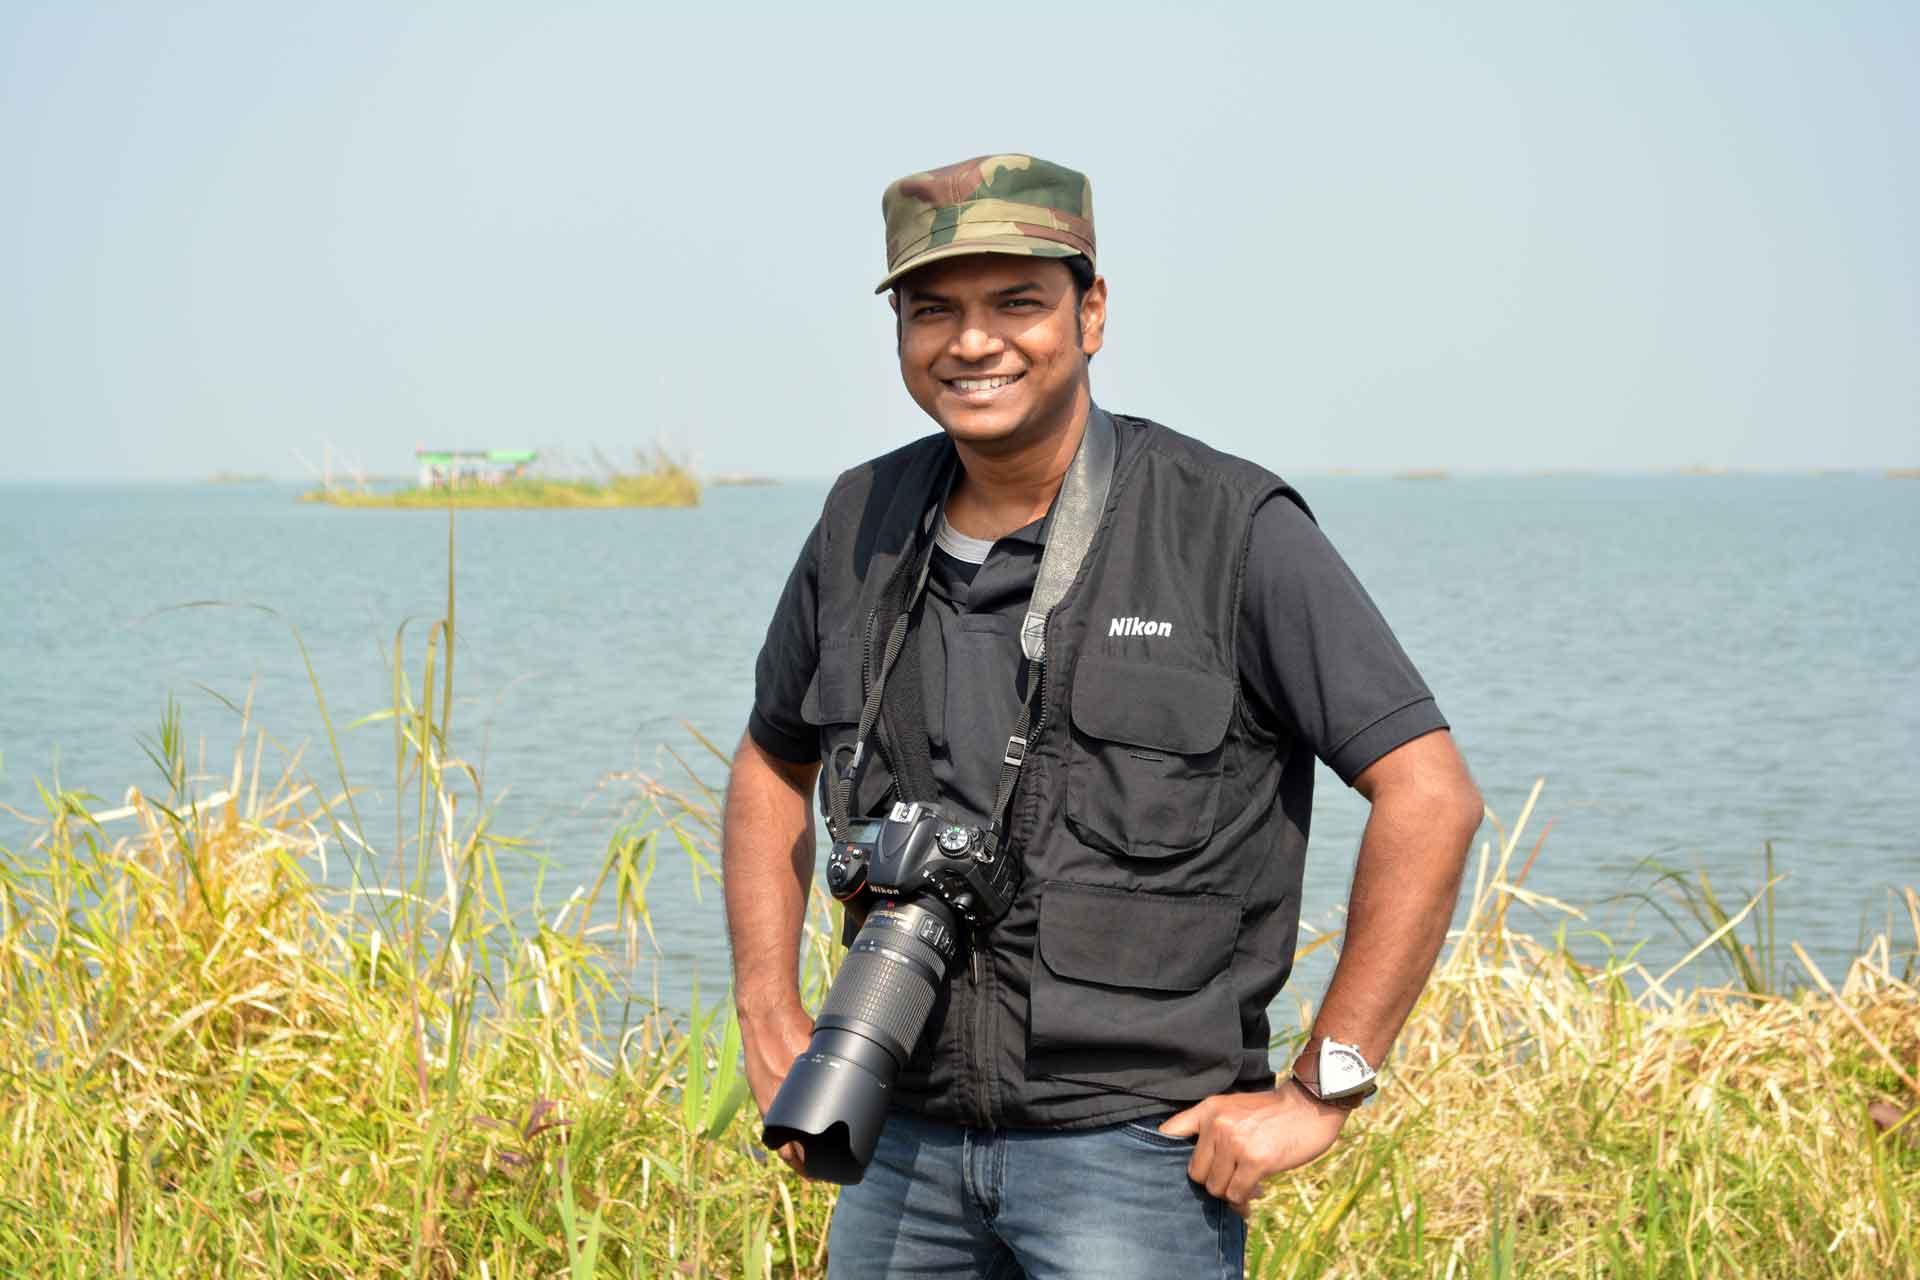 Shayak Raychaudhuri - Nikon Mentors